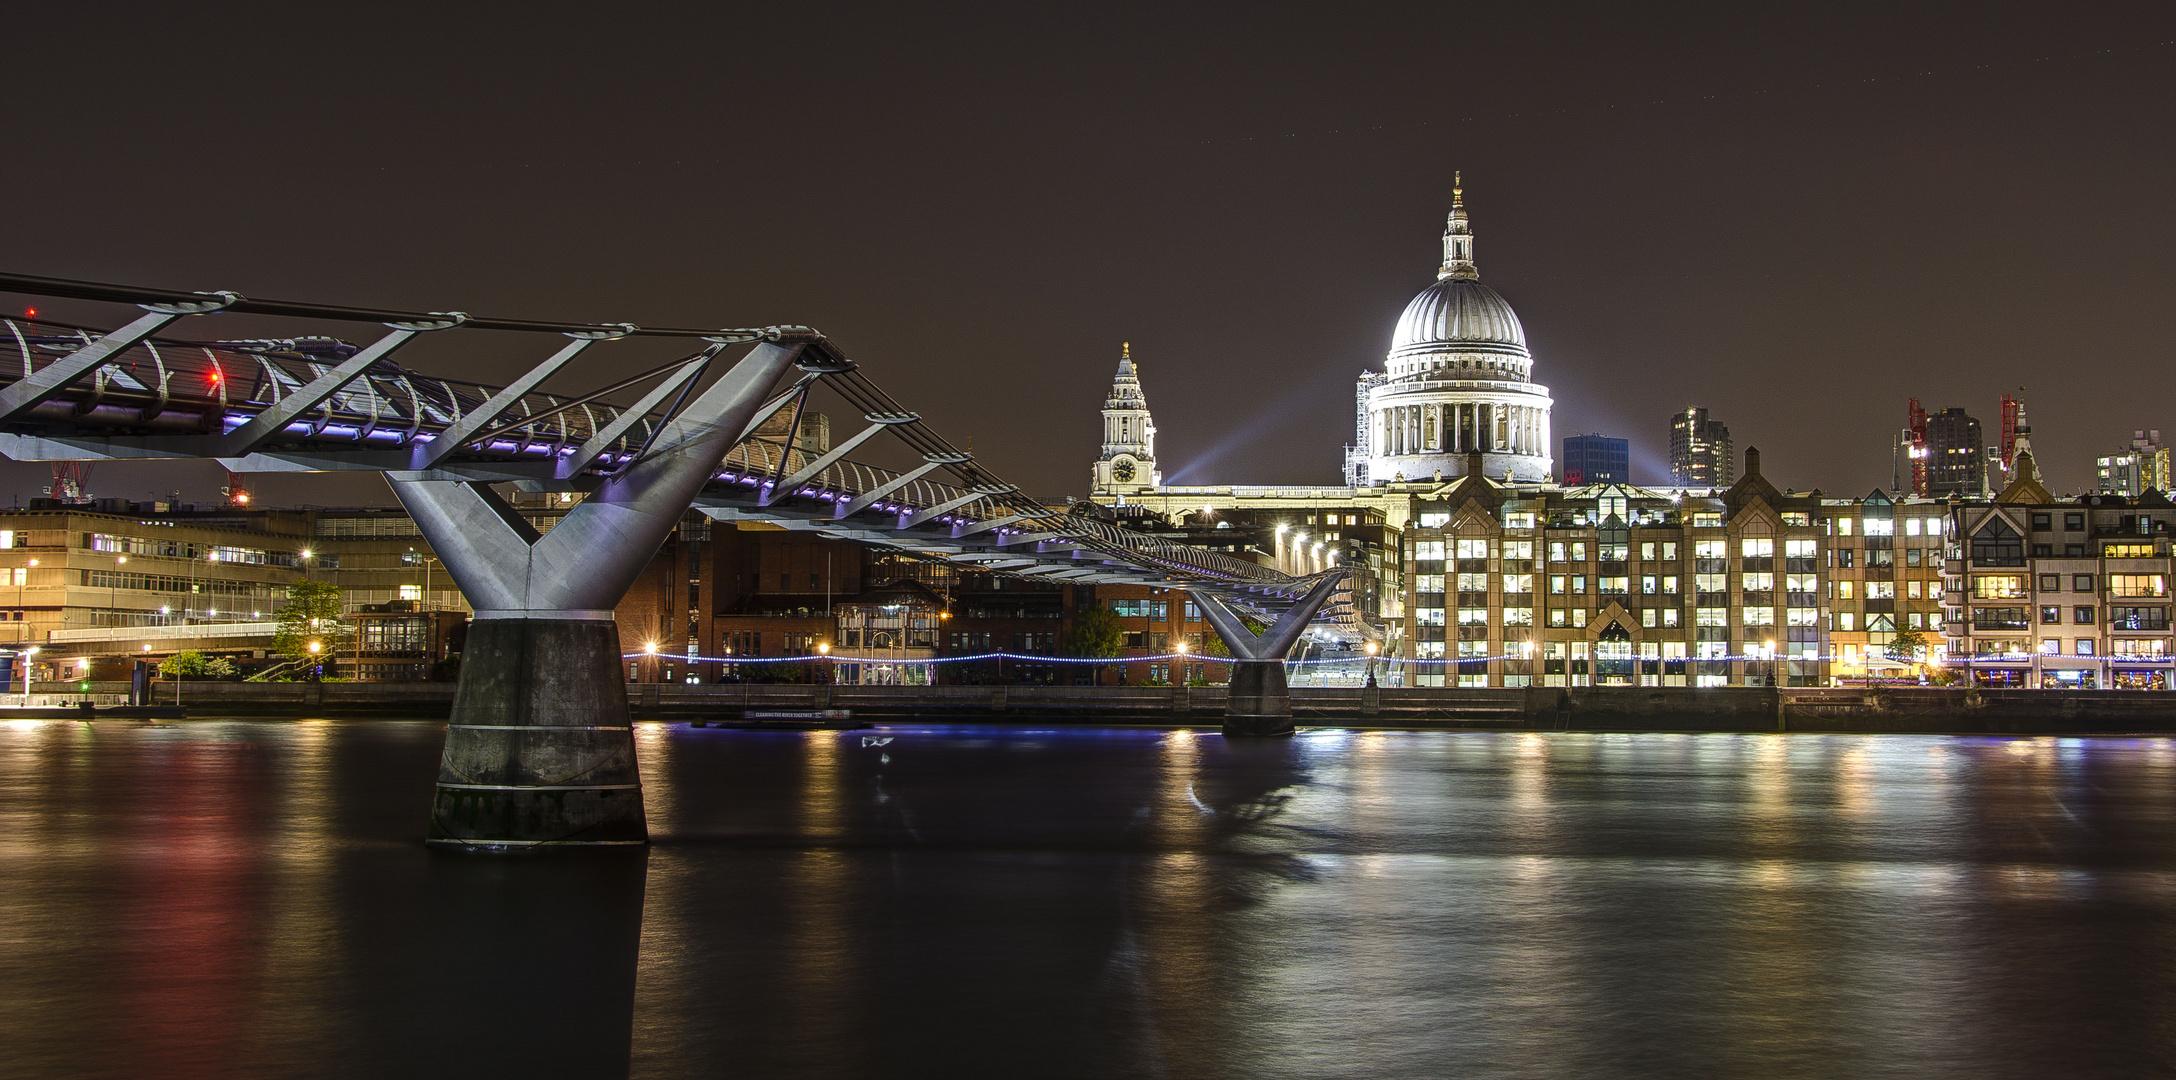 London - Millenium Bridge & St Pauls Cathedral - 03